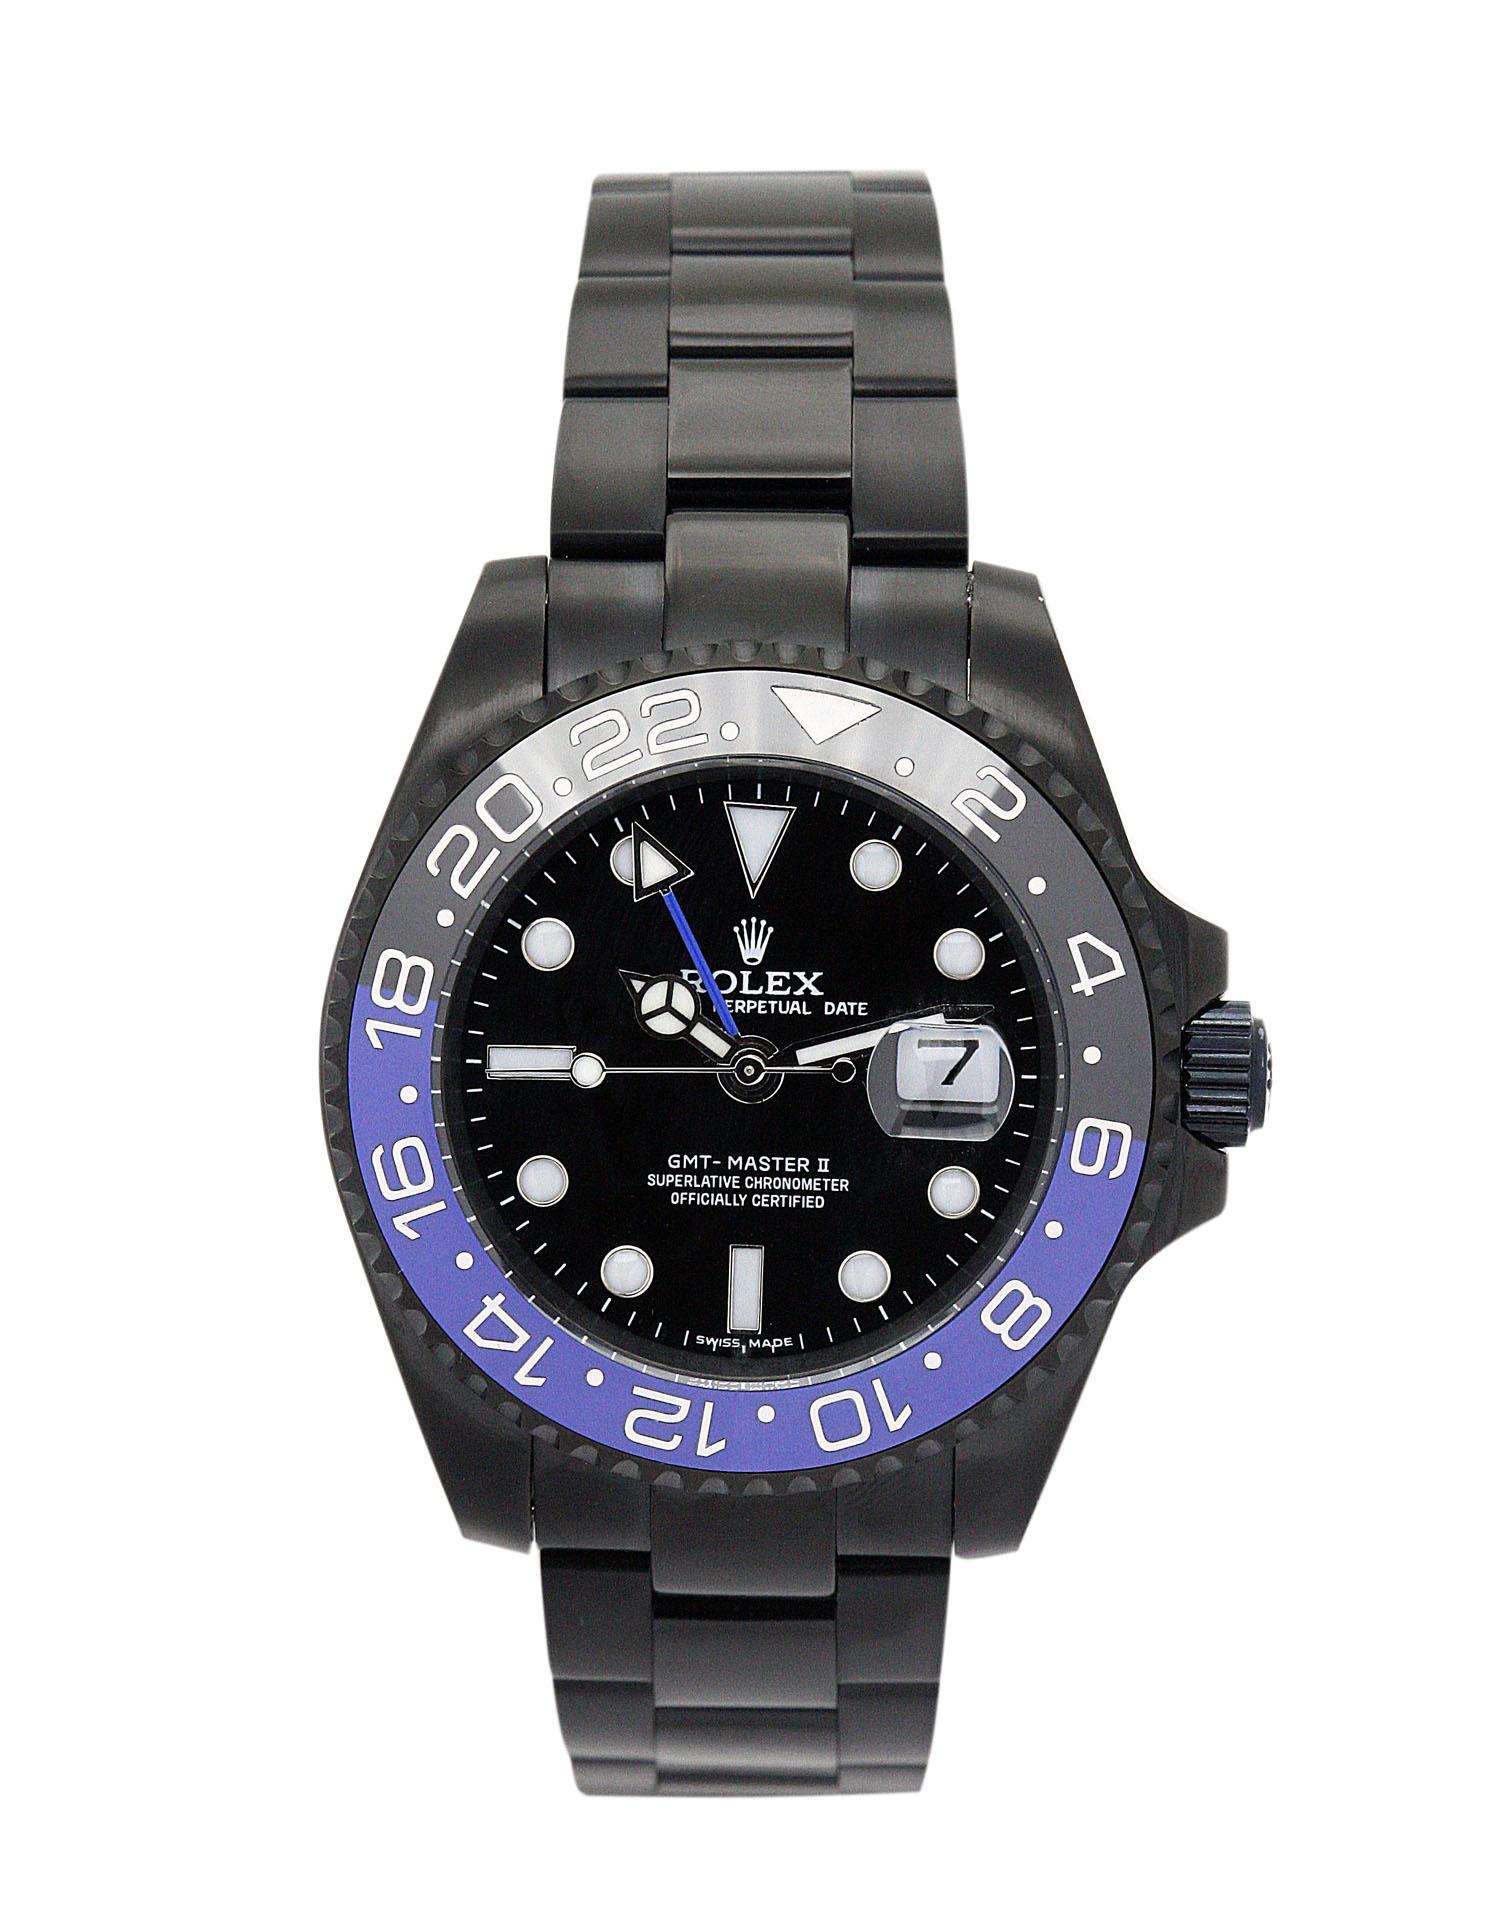 Rolex Men Oyster Perpetual 176200 Men  Black Adn Blue Steel Case Automatic Movement – iapac.to